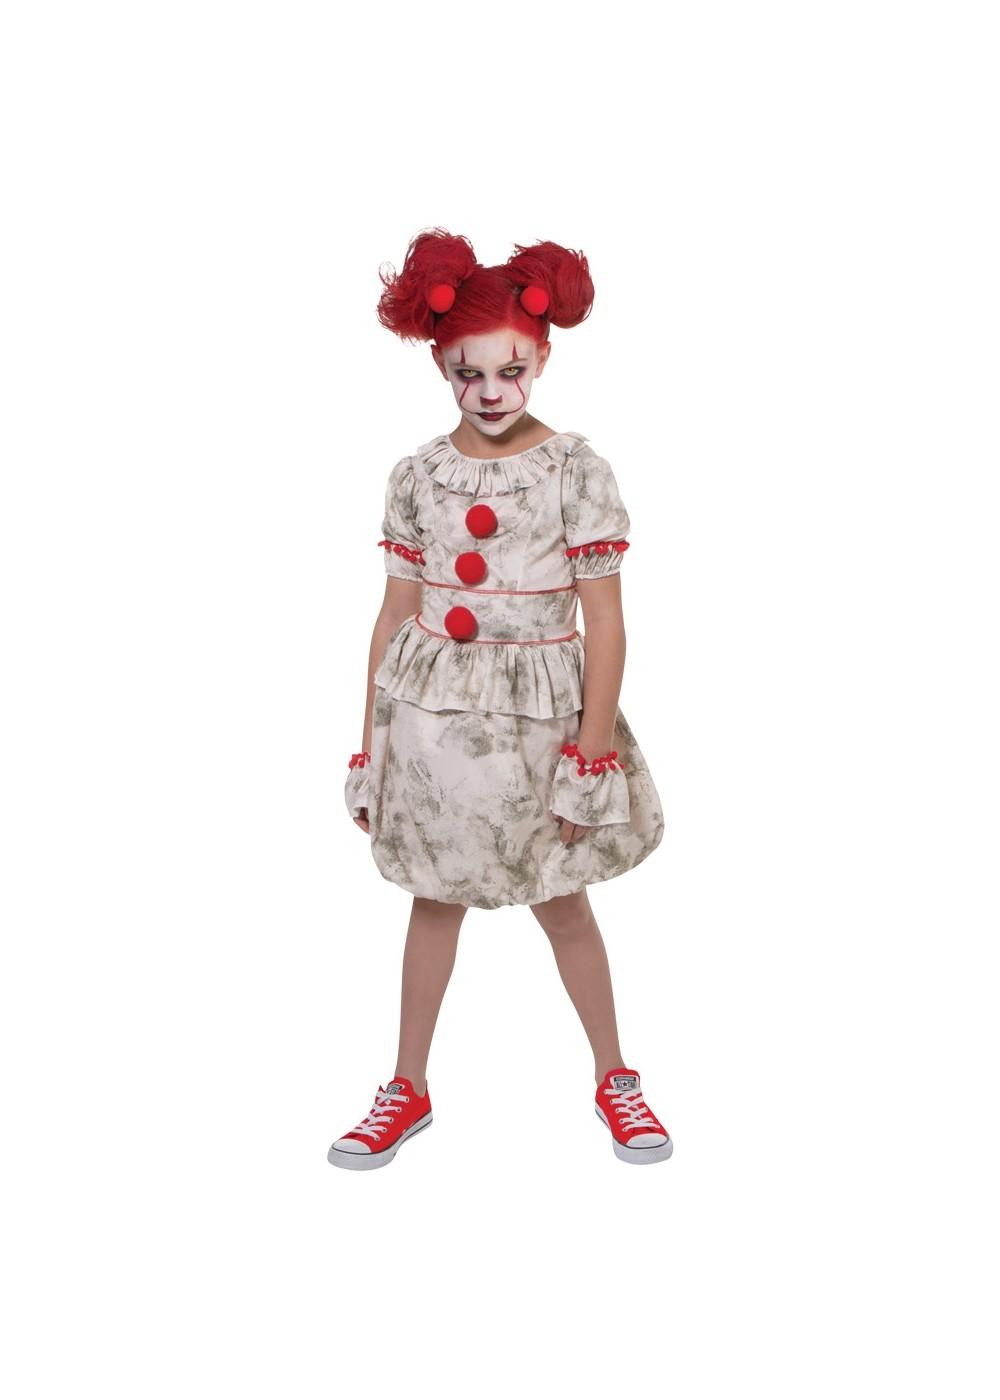 Kid\u0027s Girls Dancing Clown Costume , Scary Costumes